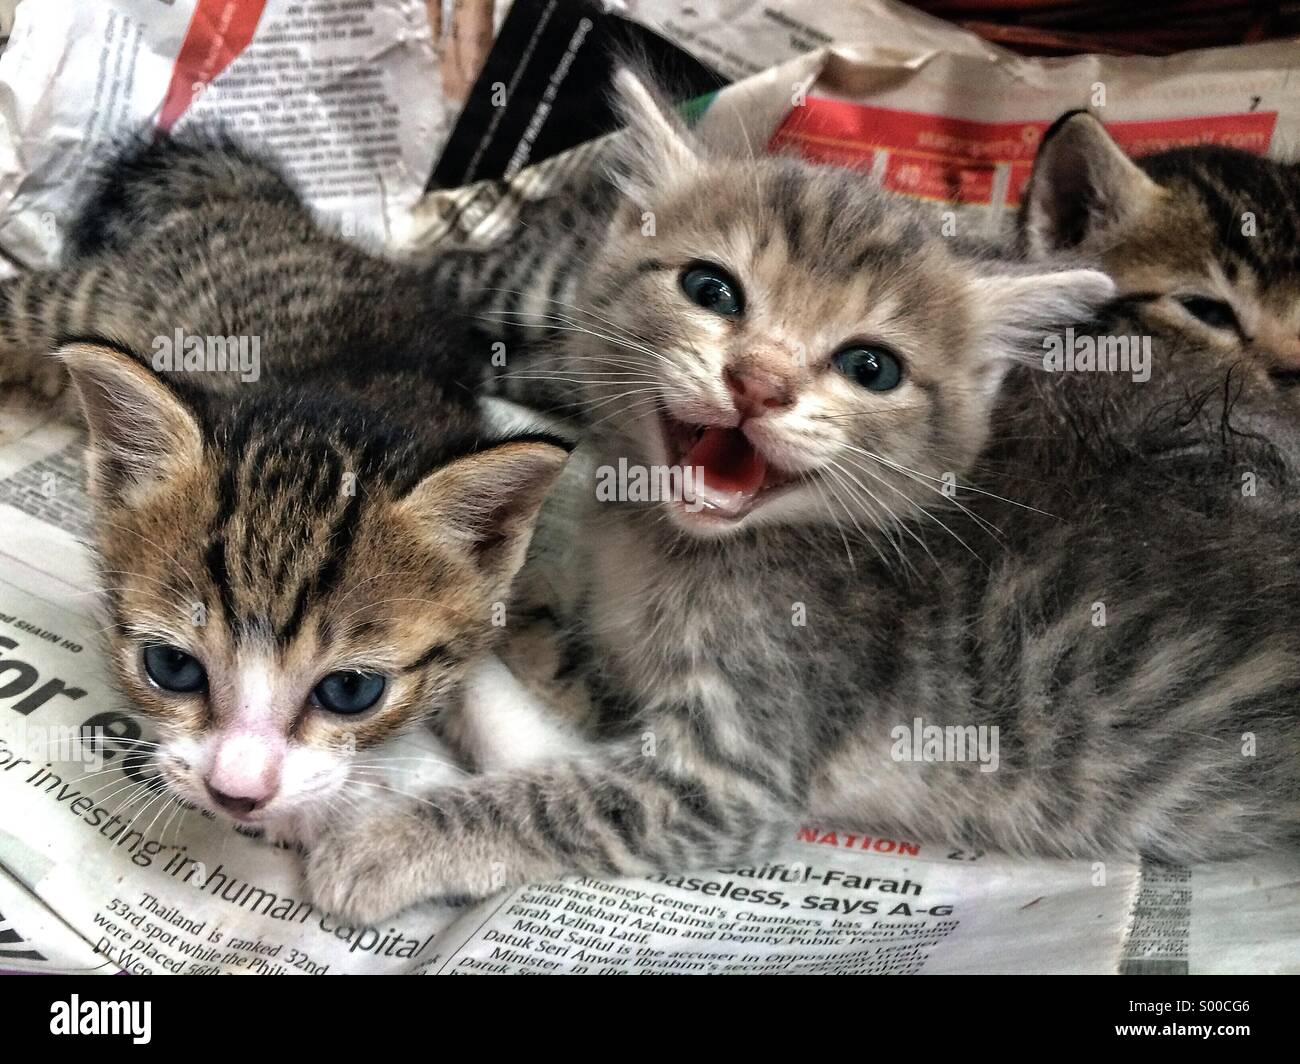 Three newborn kittens meowing at the camera - Stock Image